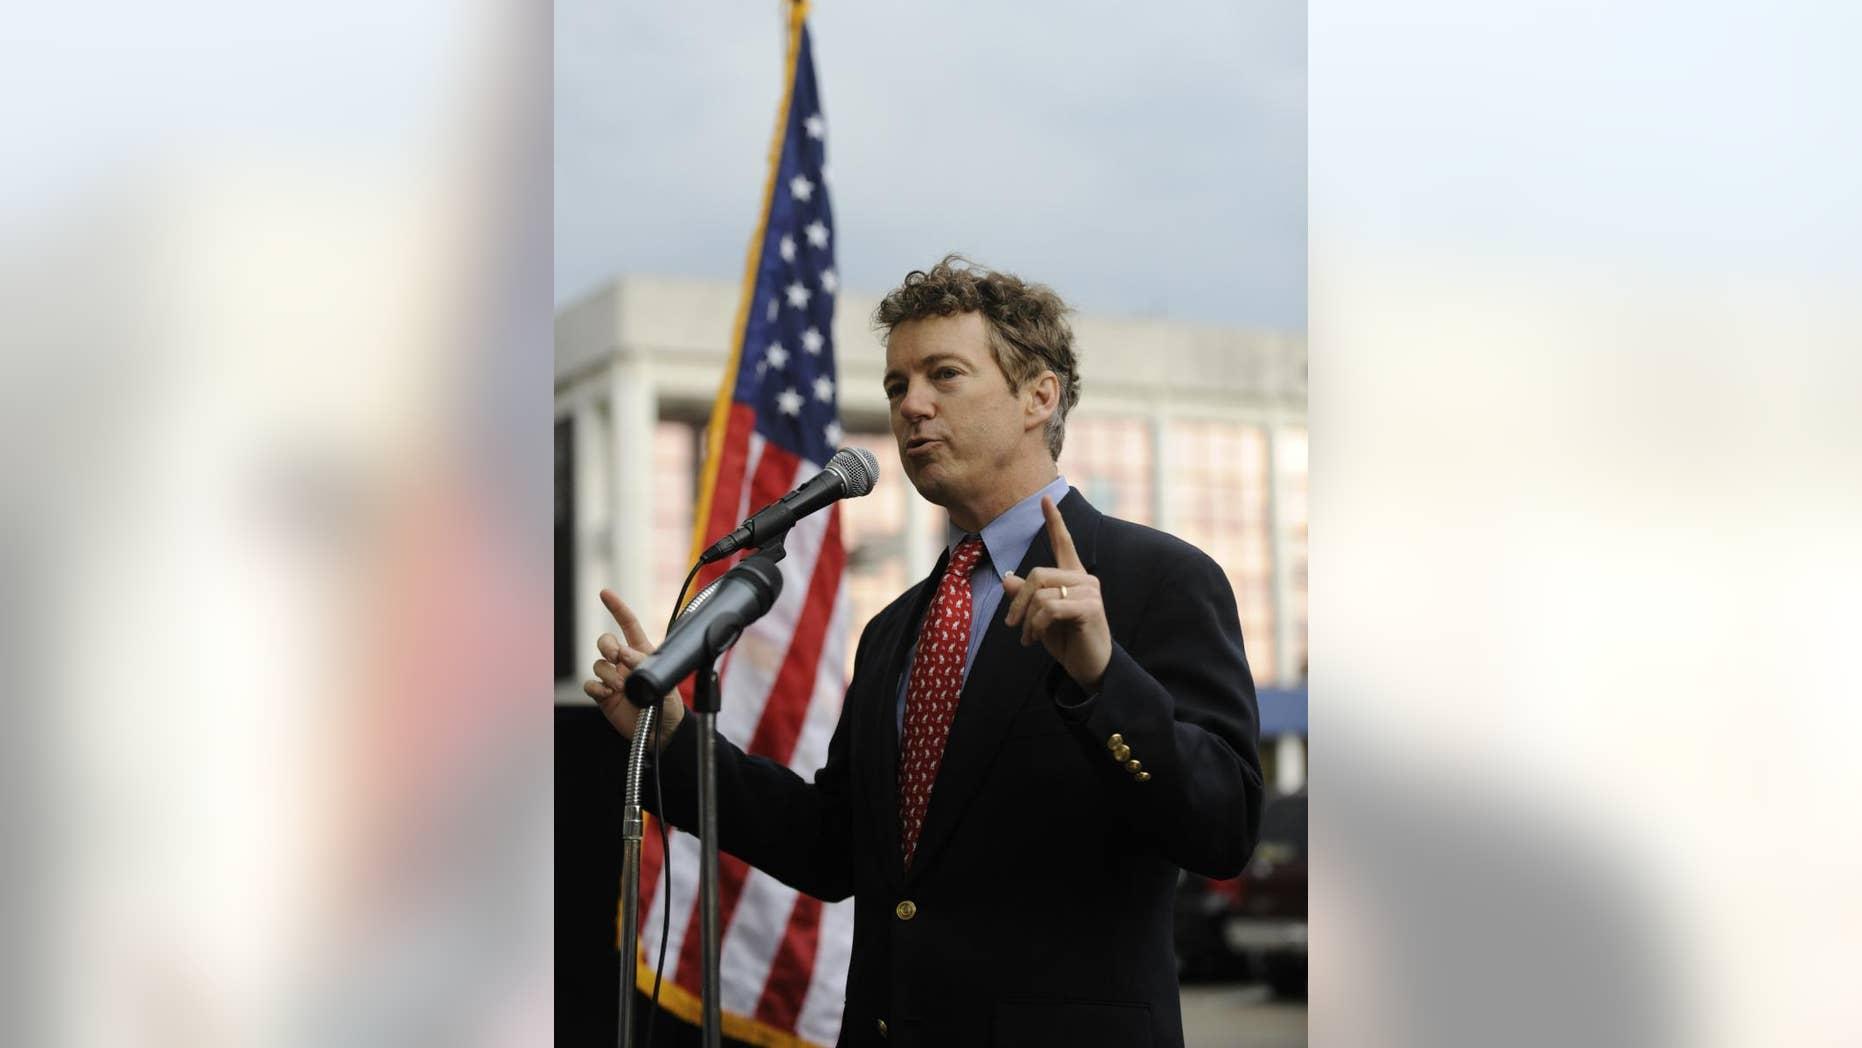 Sen. Rand Paul, R-Ky. (AP File Photo)